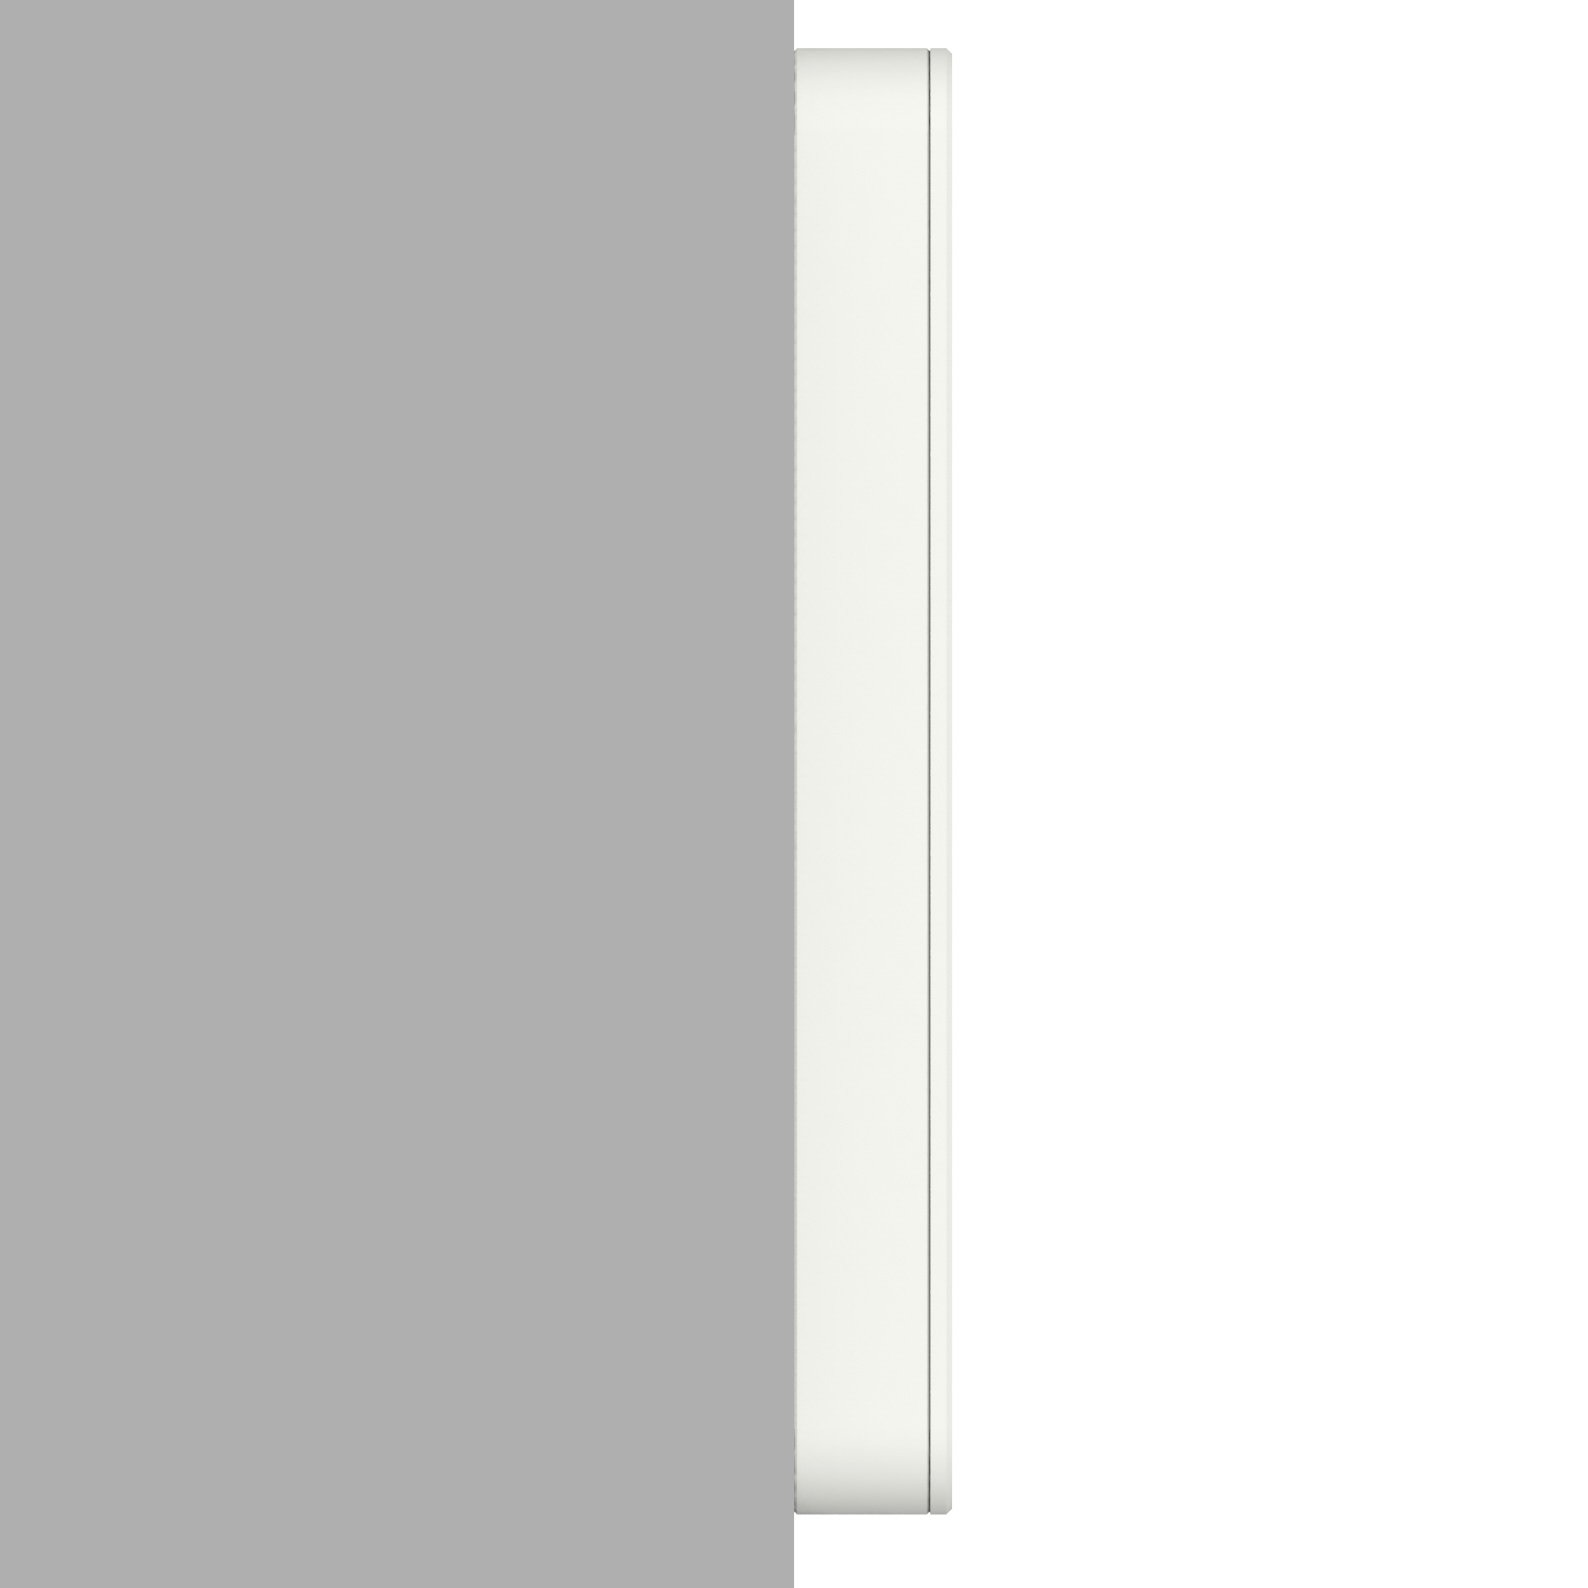 VidaMount On-Wall Tablet Mount - Samsung Galaxy Tab A 7.0 - White by VidaBox Kiosks (Image #4)